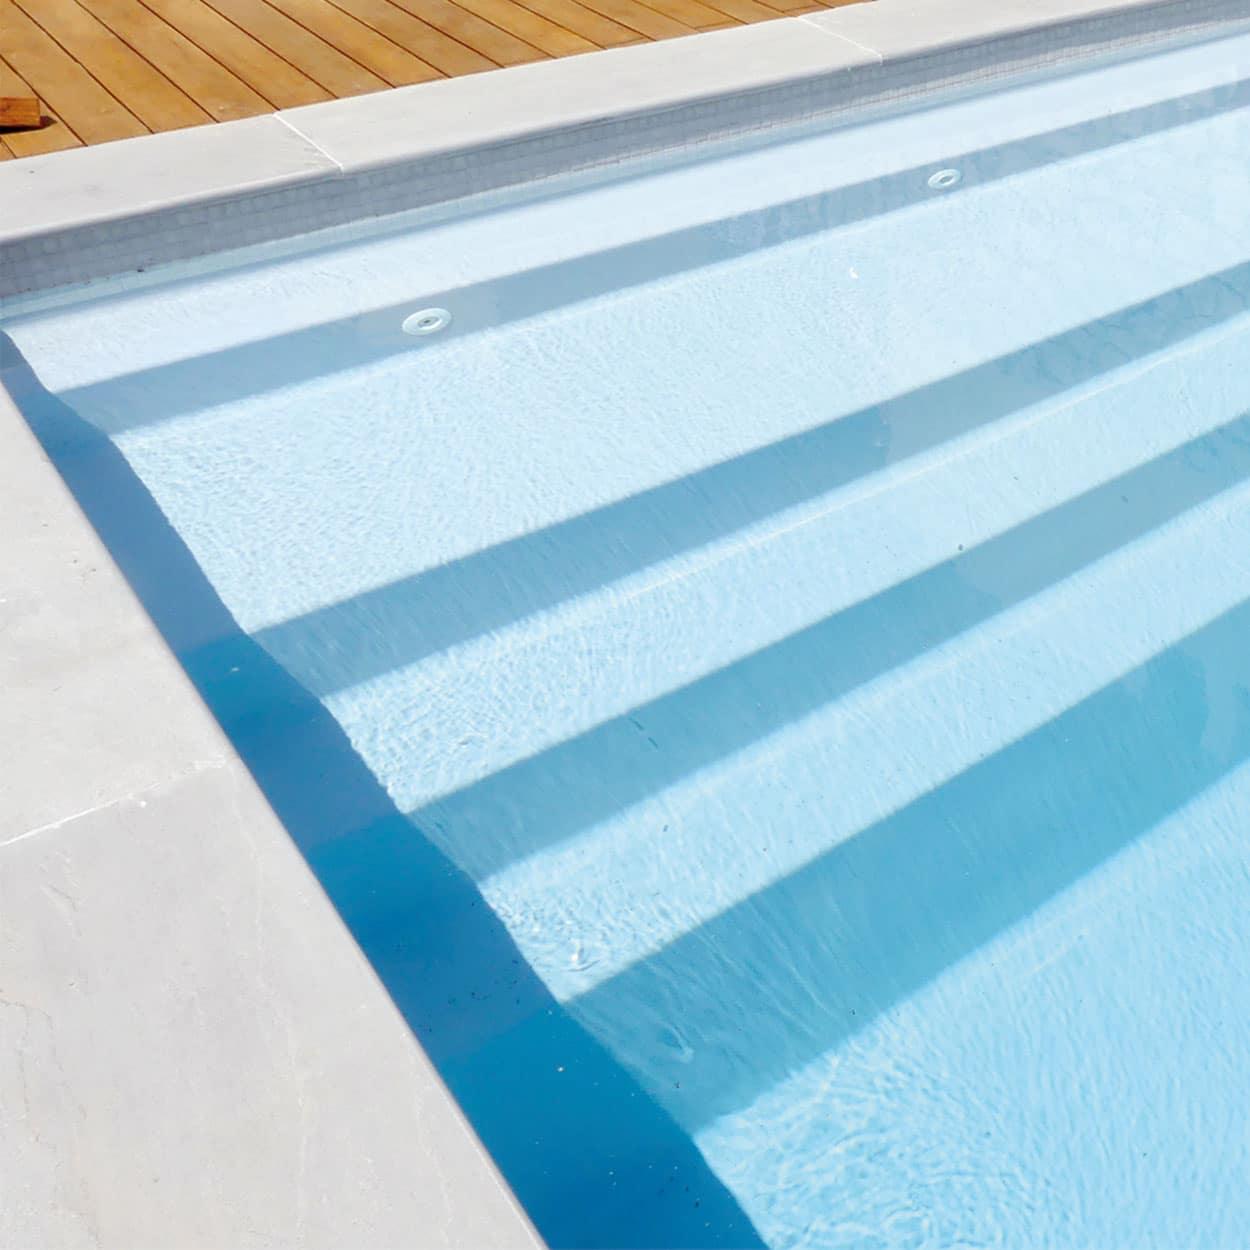 realisation-piscine-coque-inizan Modèle Inizan